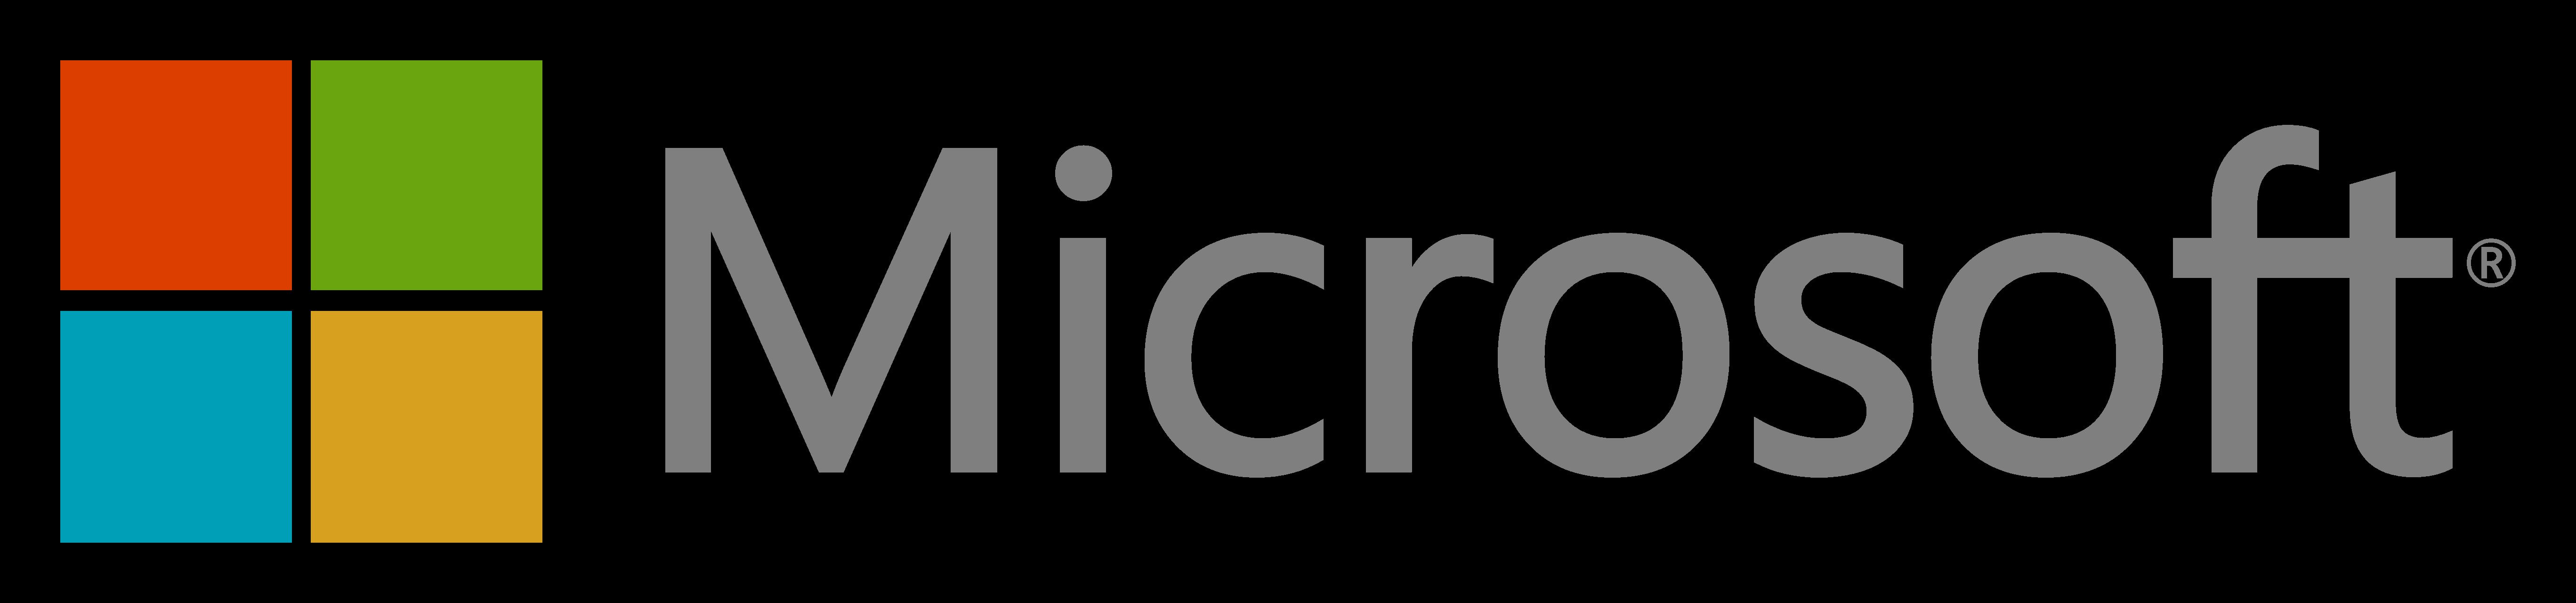 Microsoft Information Archiving logo